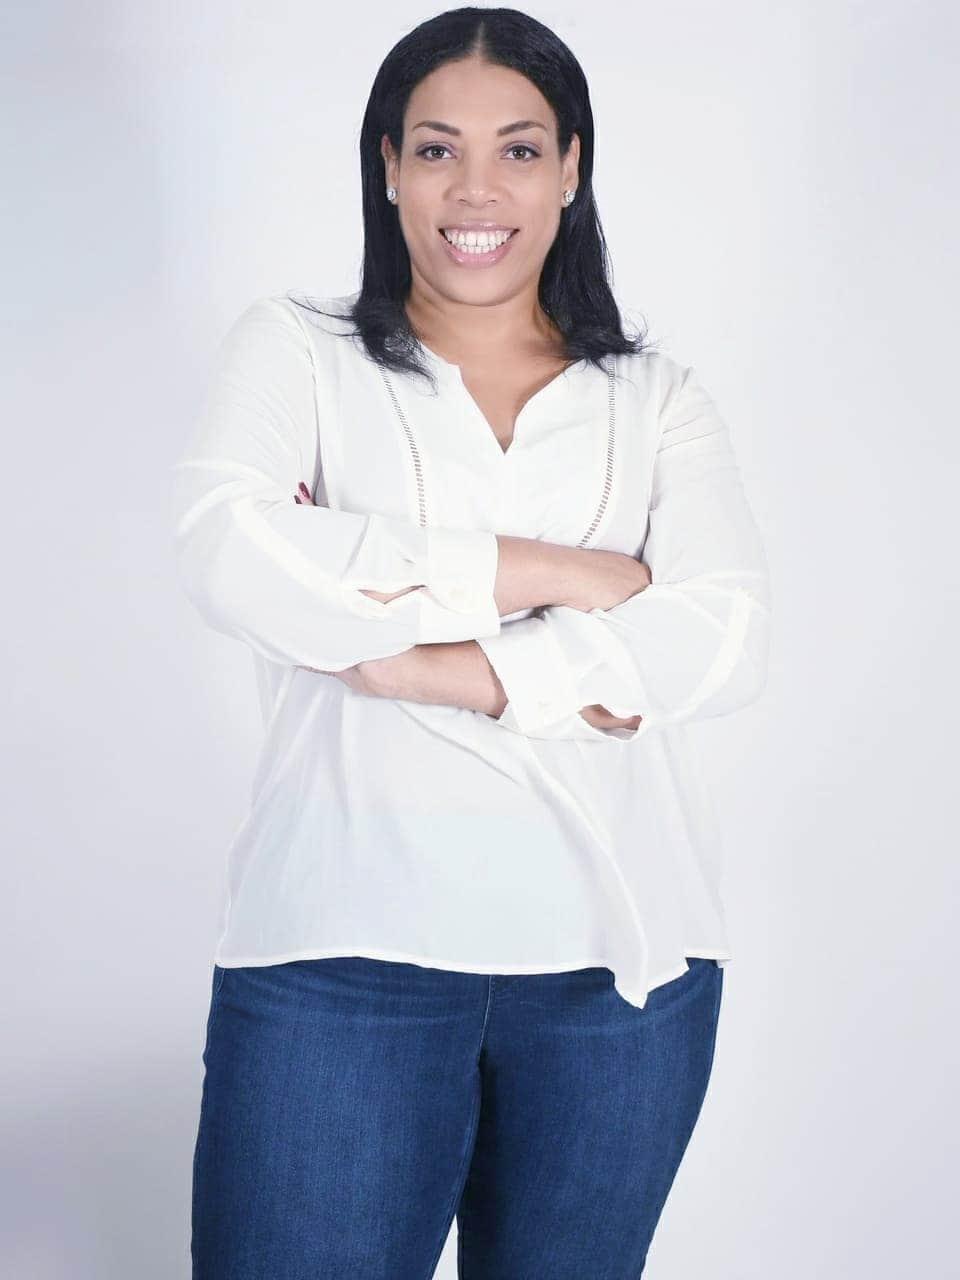 Chrissy Thornton